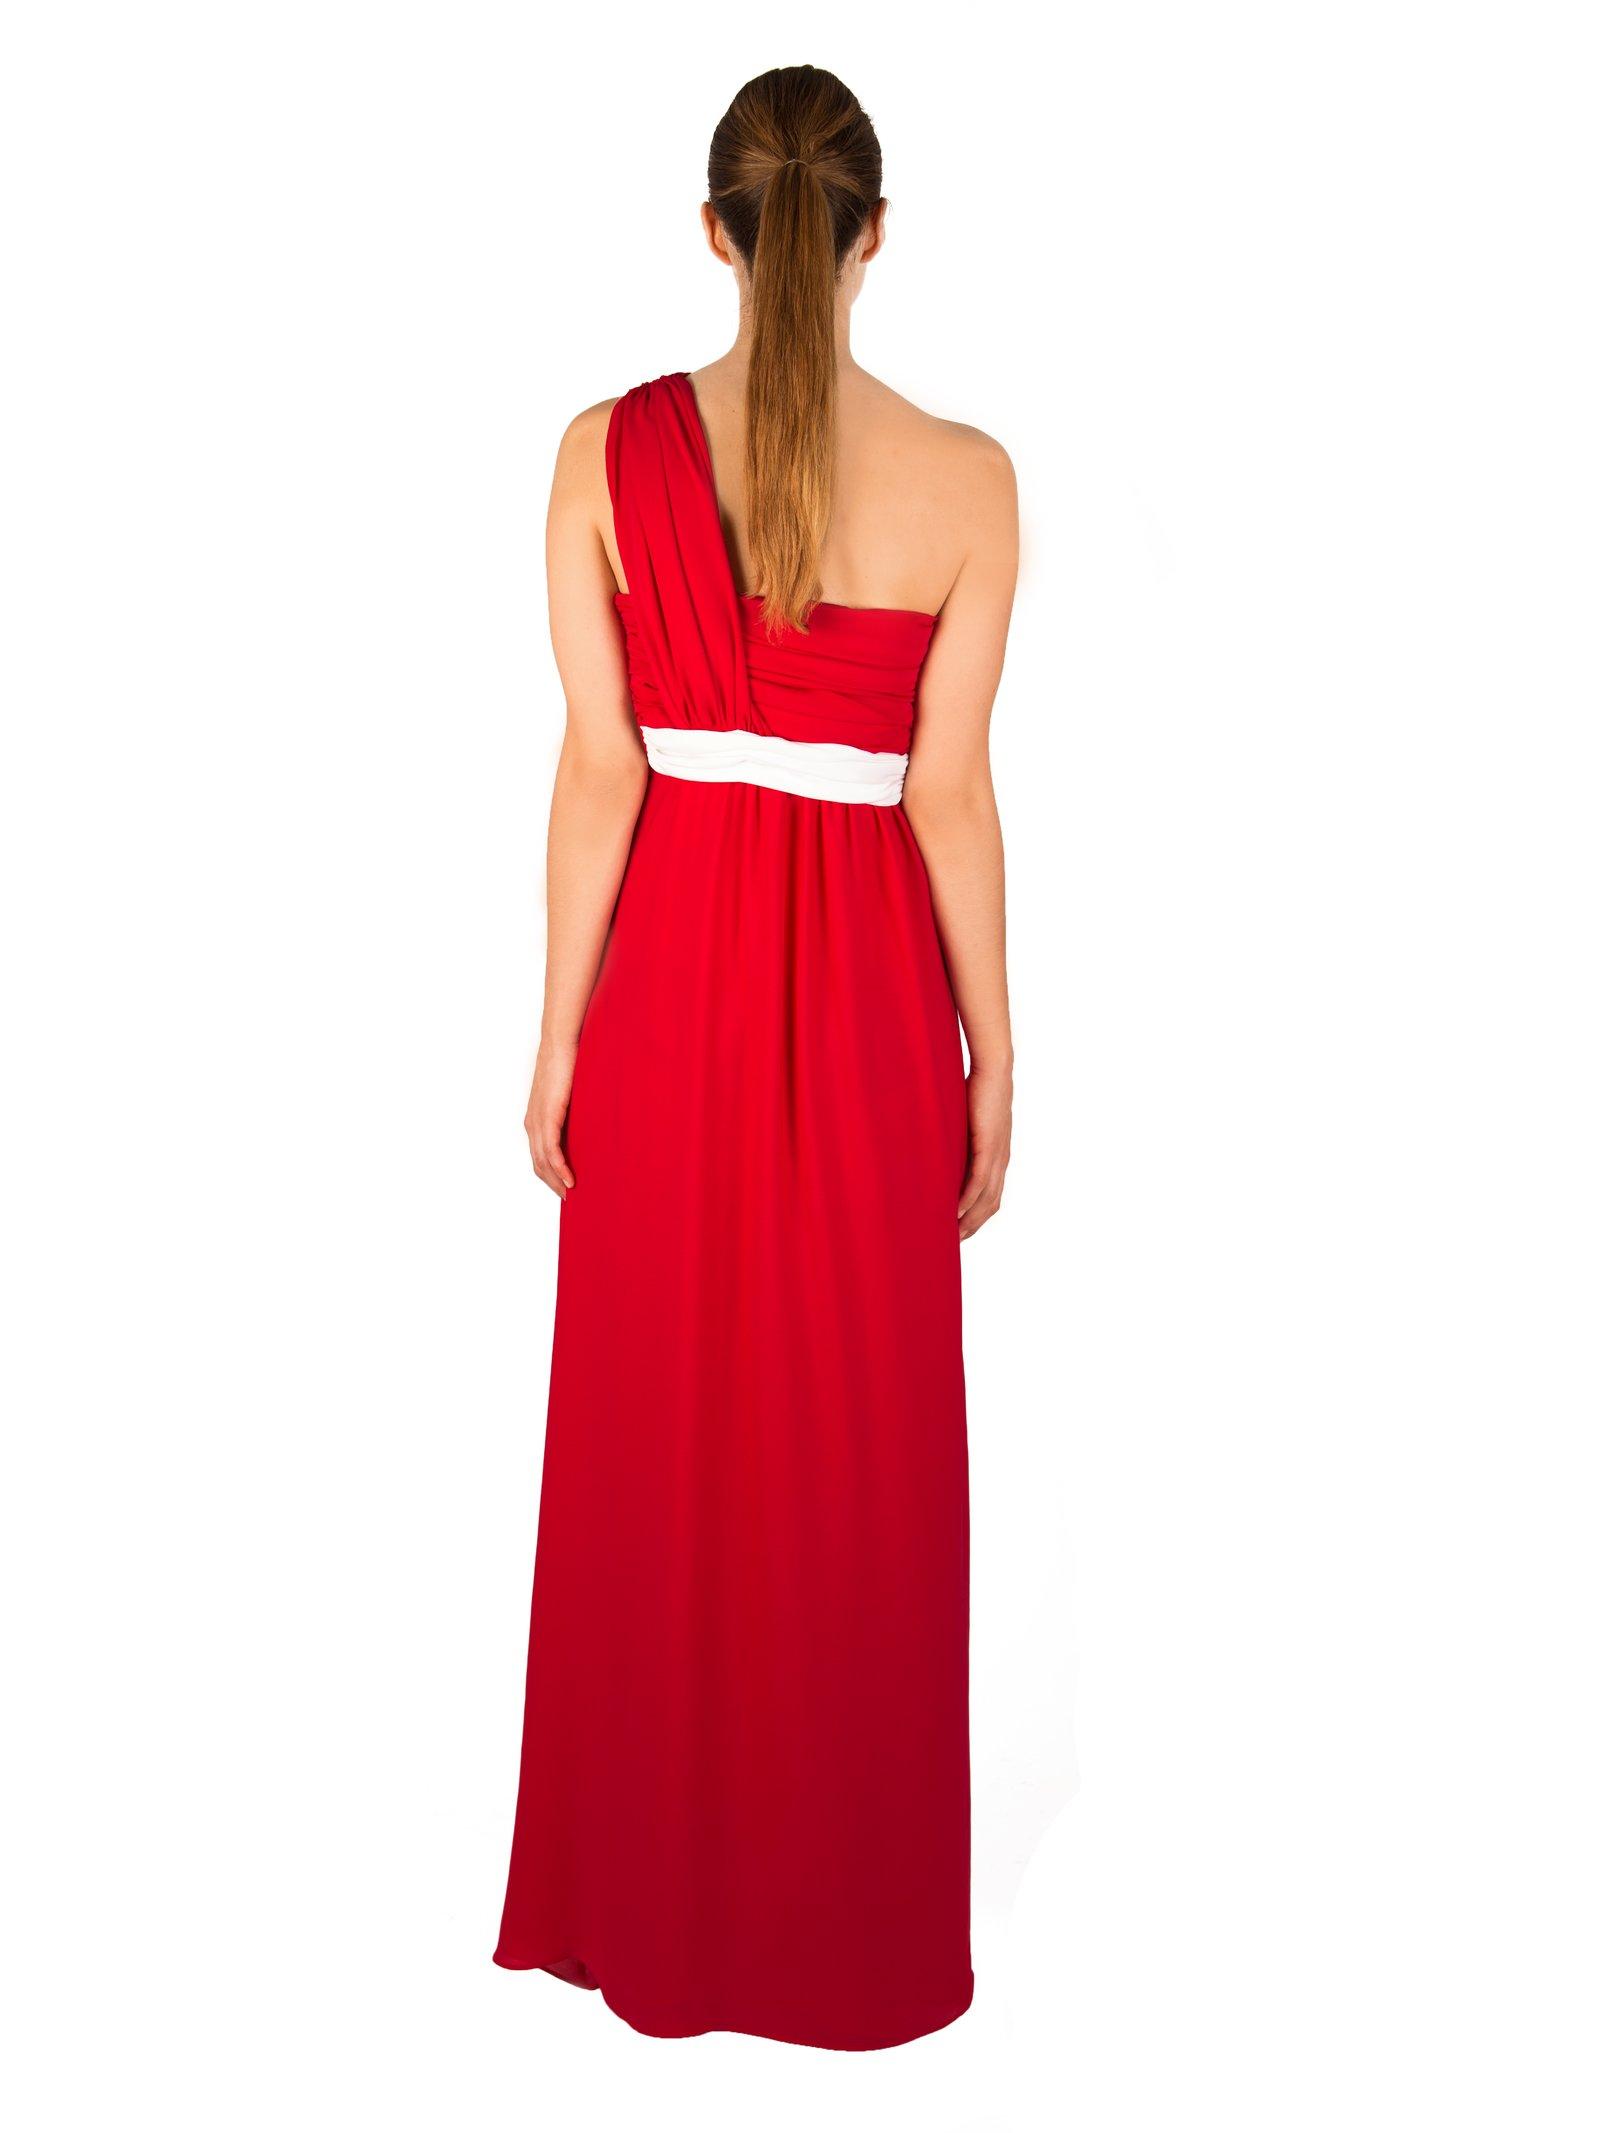 LIZA VETA Rubin Red Pleated Silk Double Georgette Dress